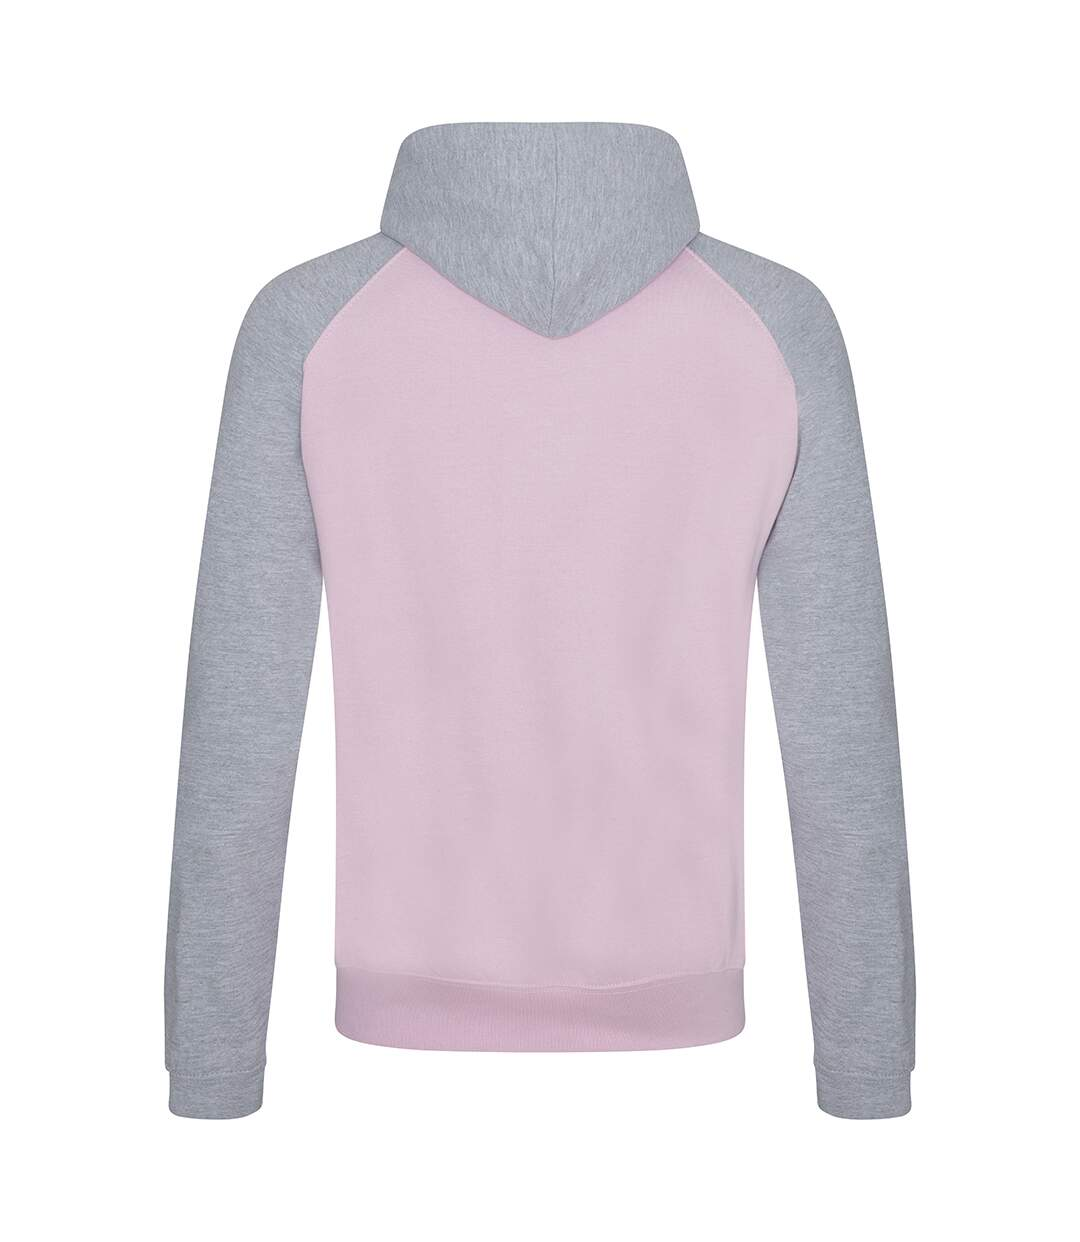 Awdis Just Hoods Adults Unisex Two Tone Hooded Baseball Sweatshirt/Hoodie (Jet Black/Fire Red) - UTRW3928